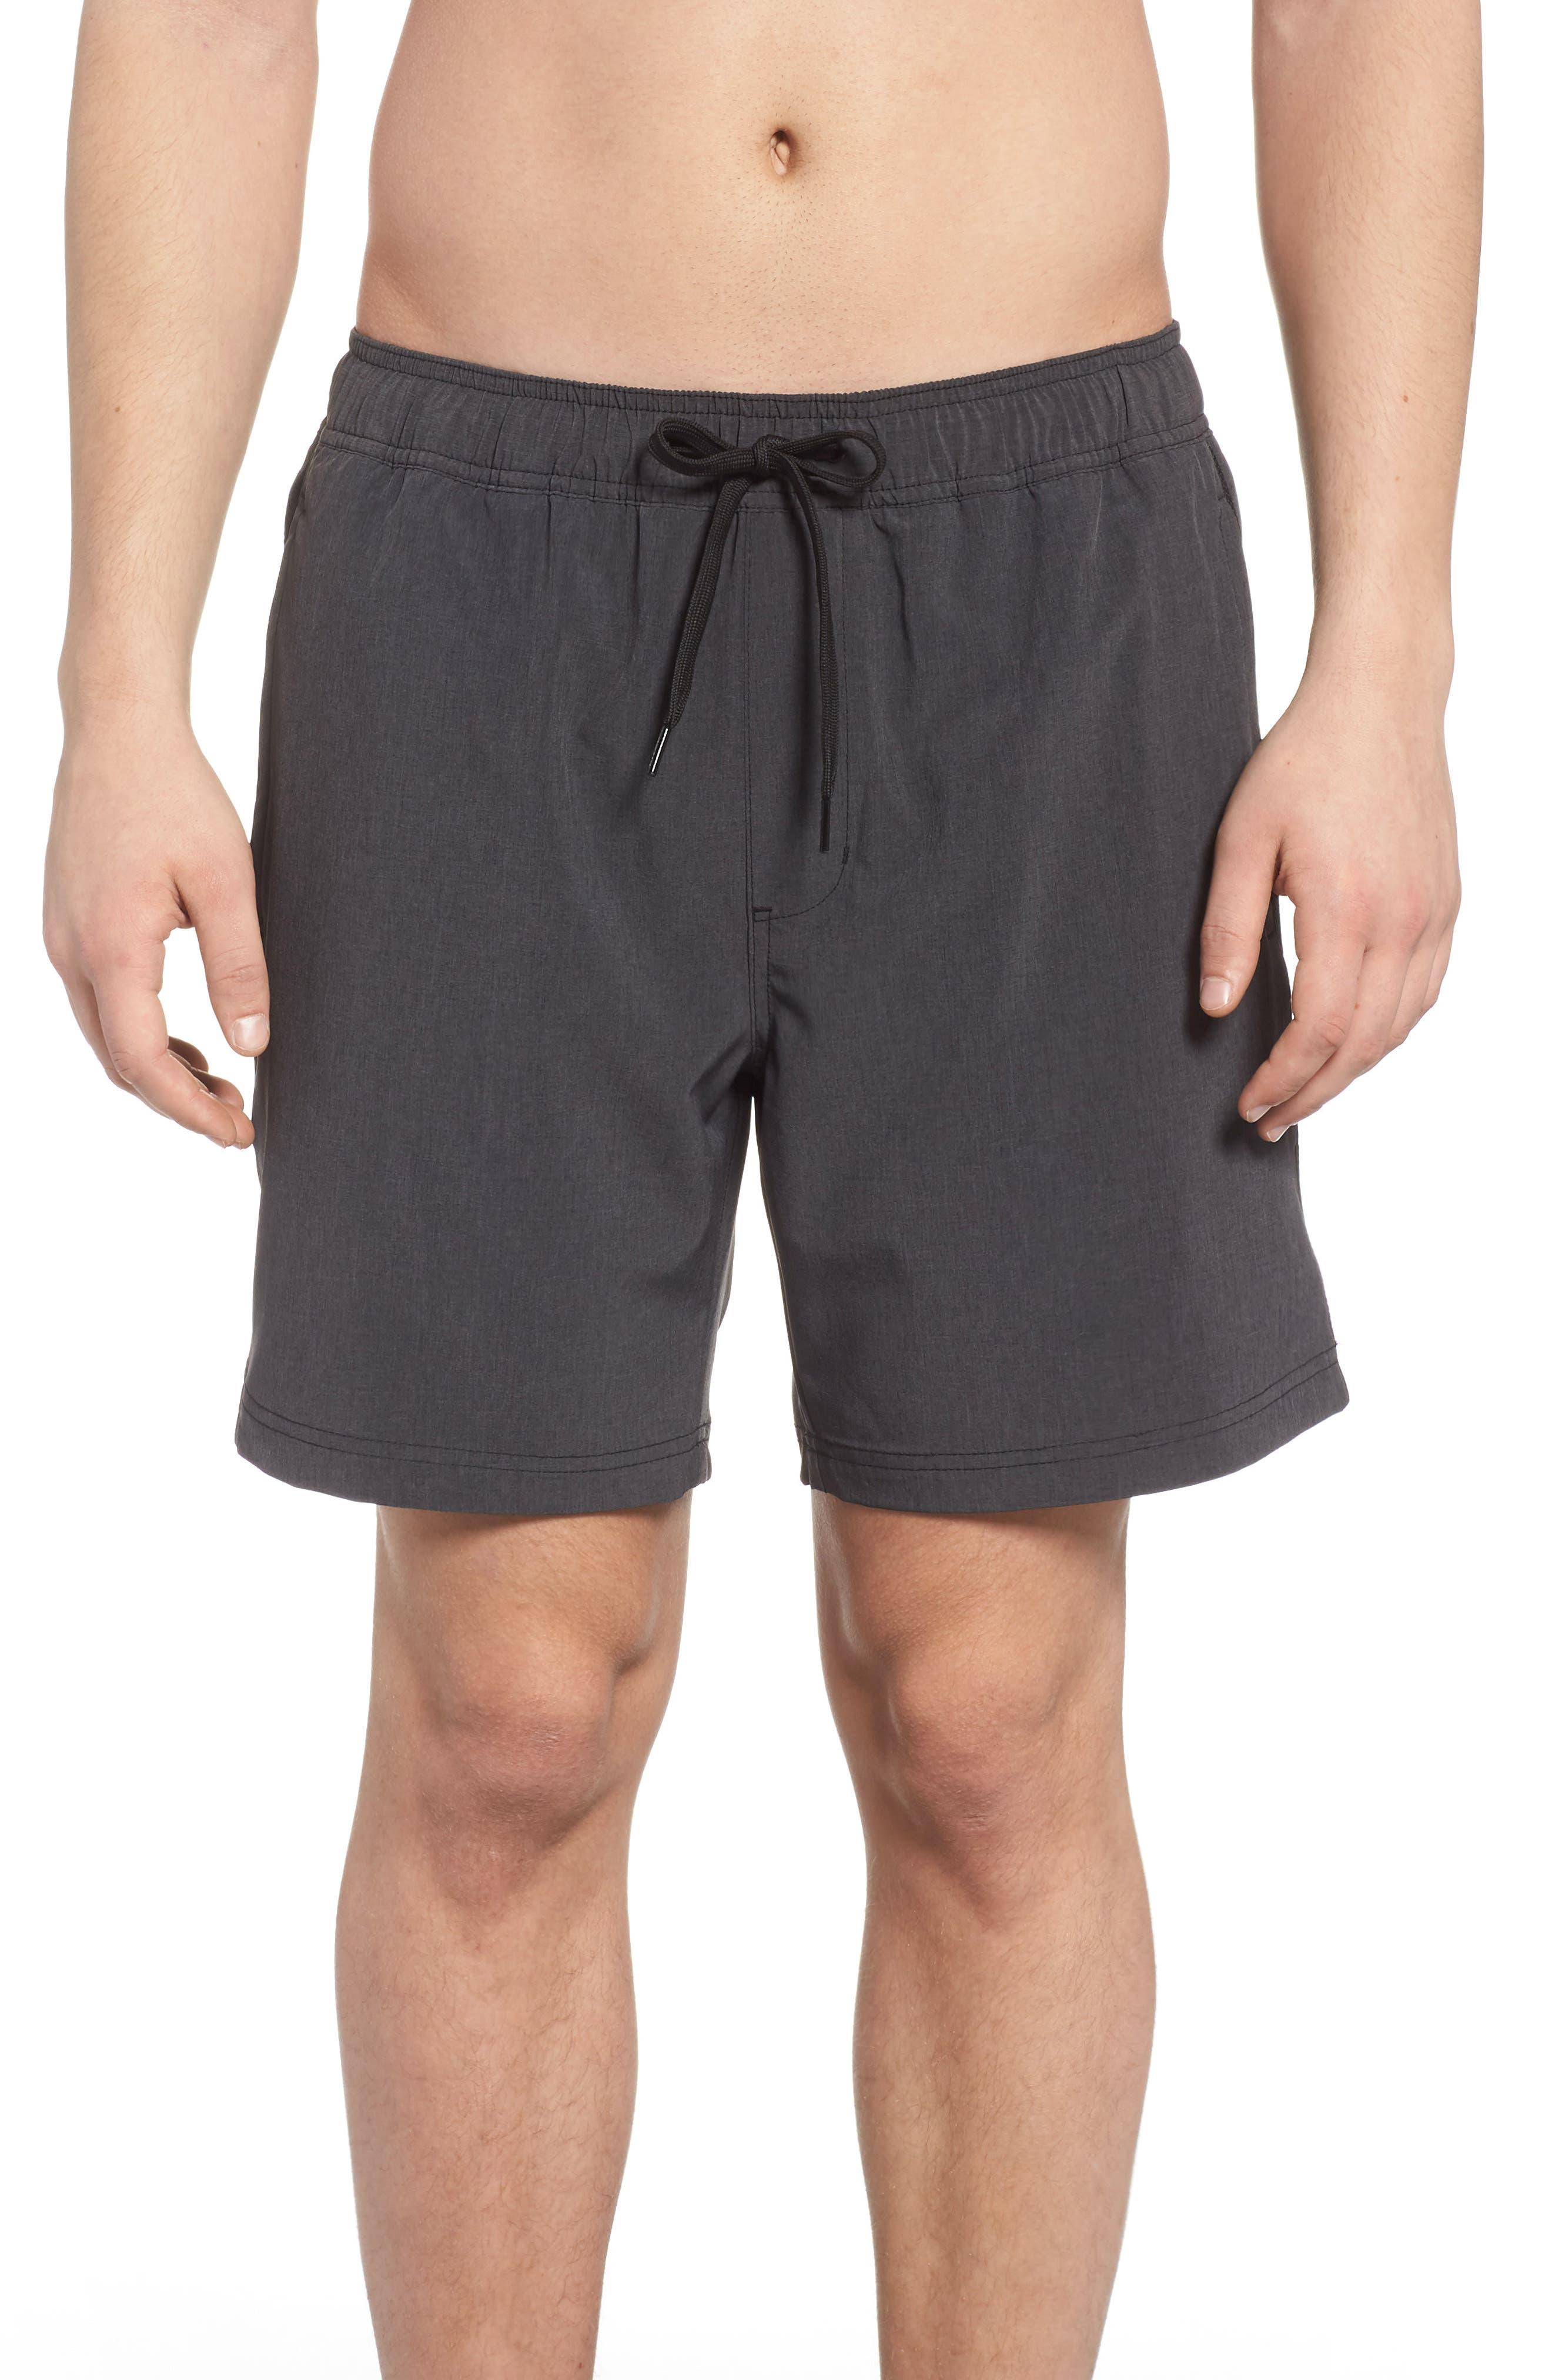 Stretch Swim Trunks,                         Main,                         color, Black Oxide Heather